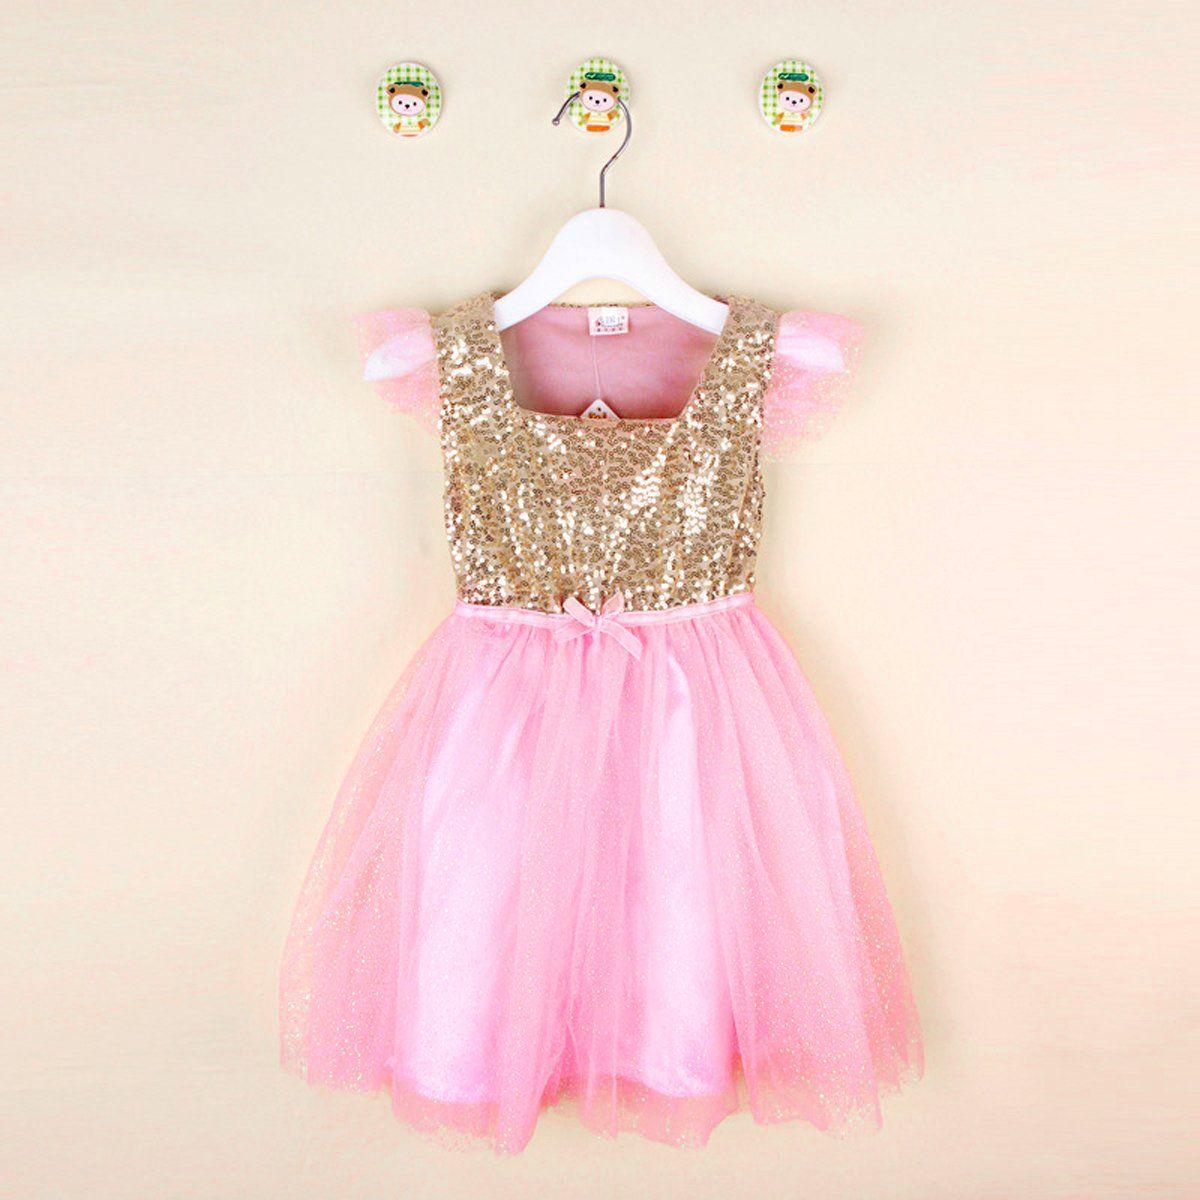 Flower Girls Summer Princess Dress Kids Baby Party Pageant Tutu Dresses Clothes